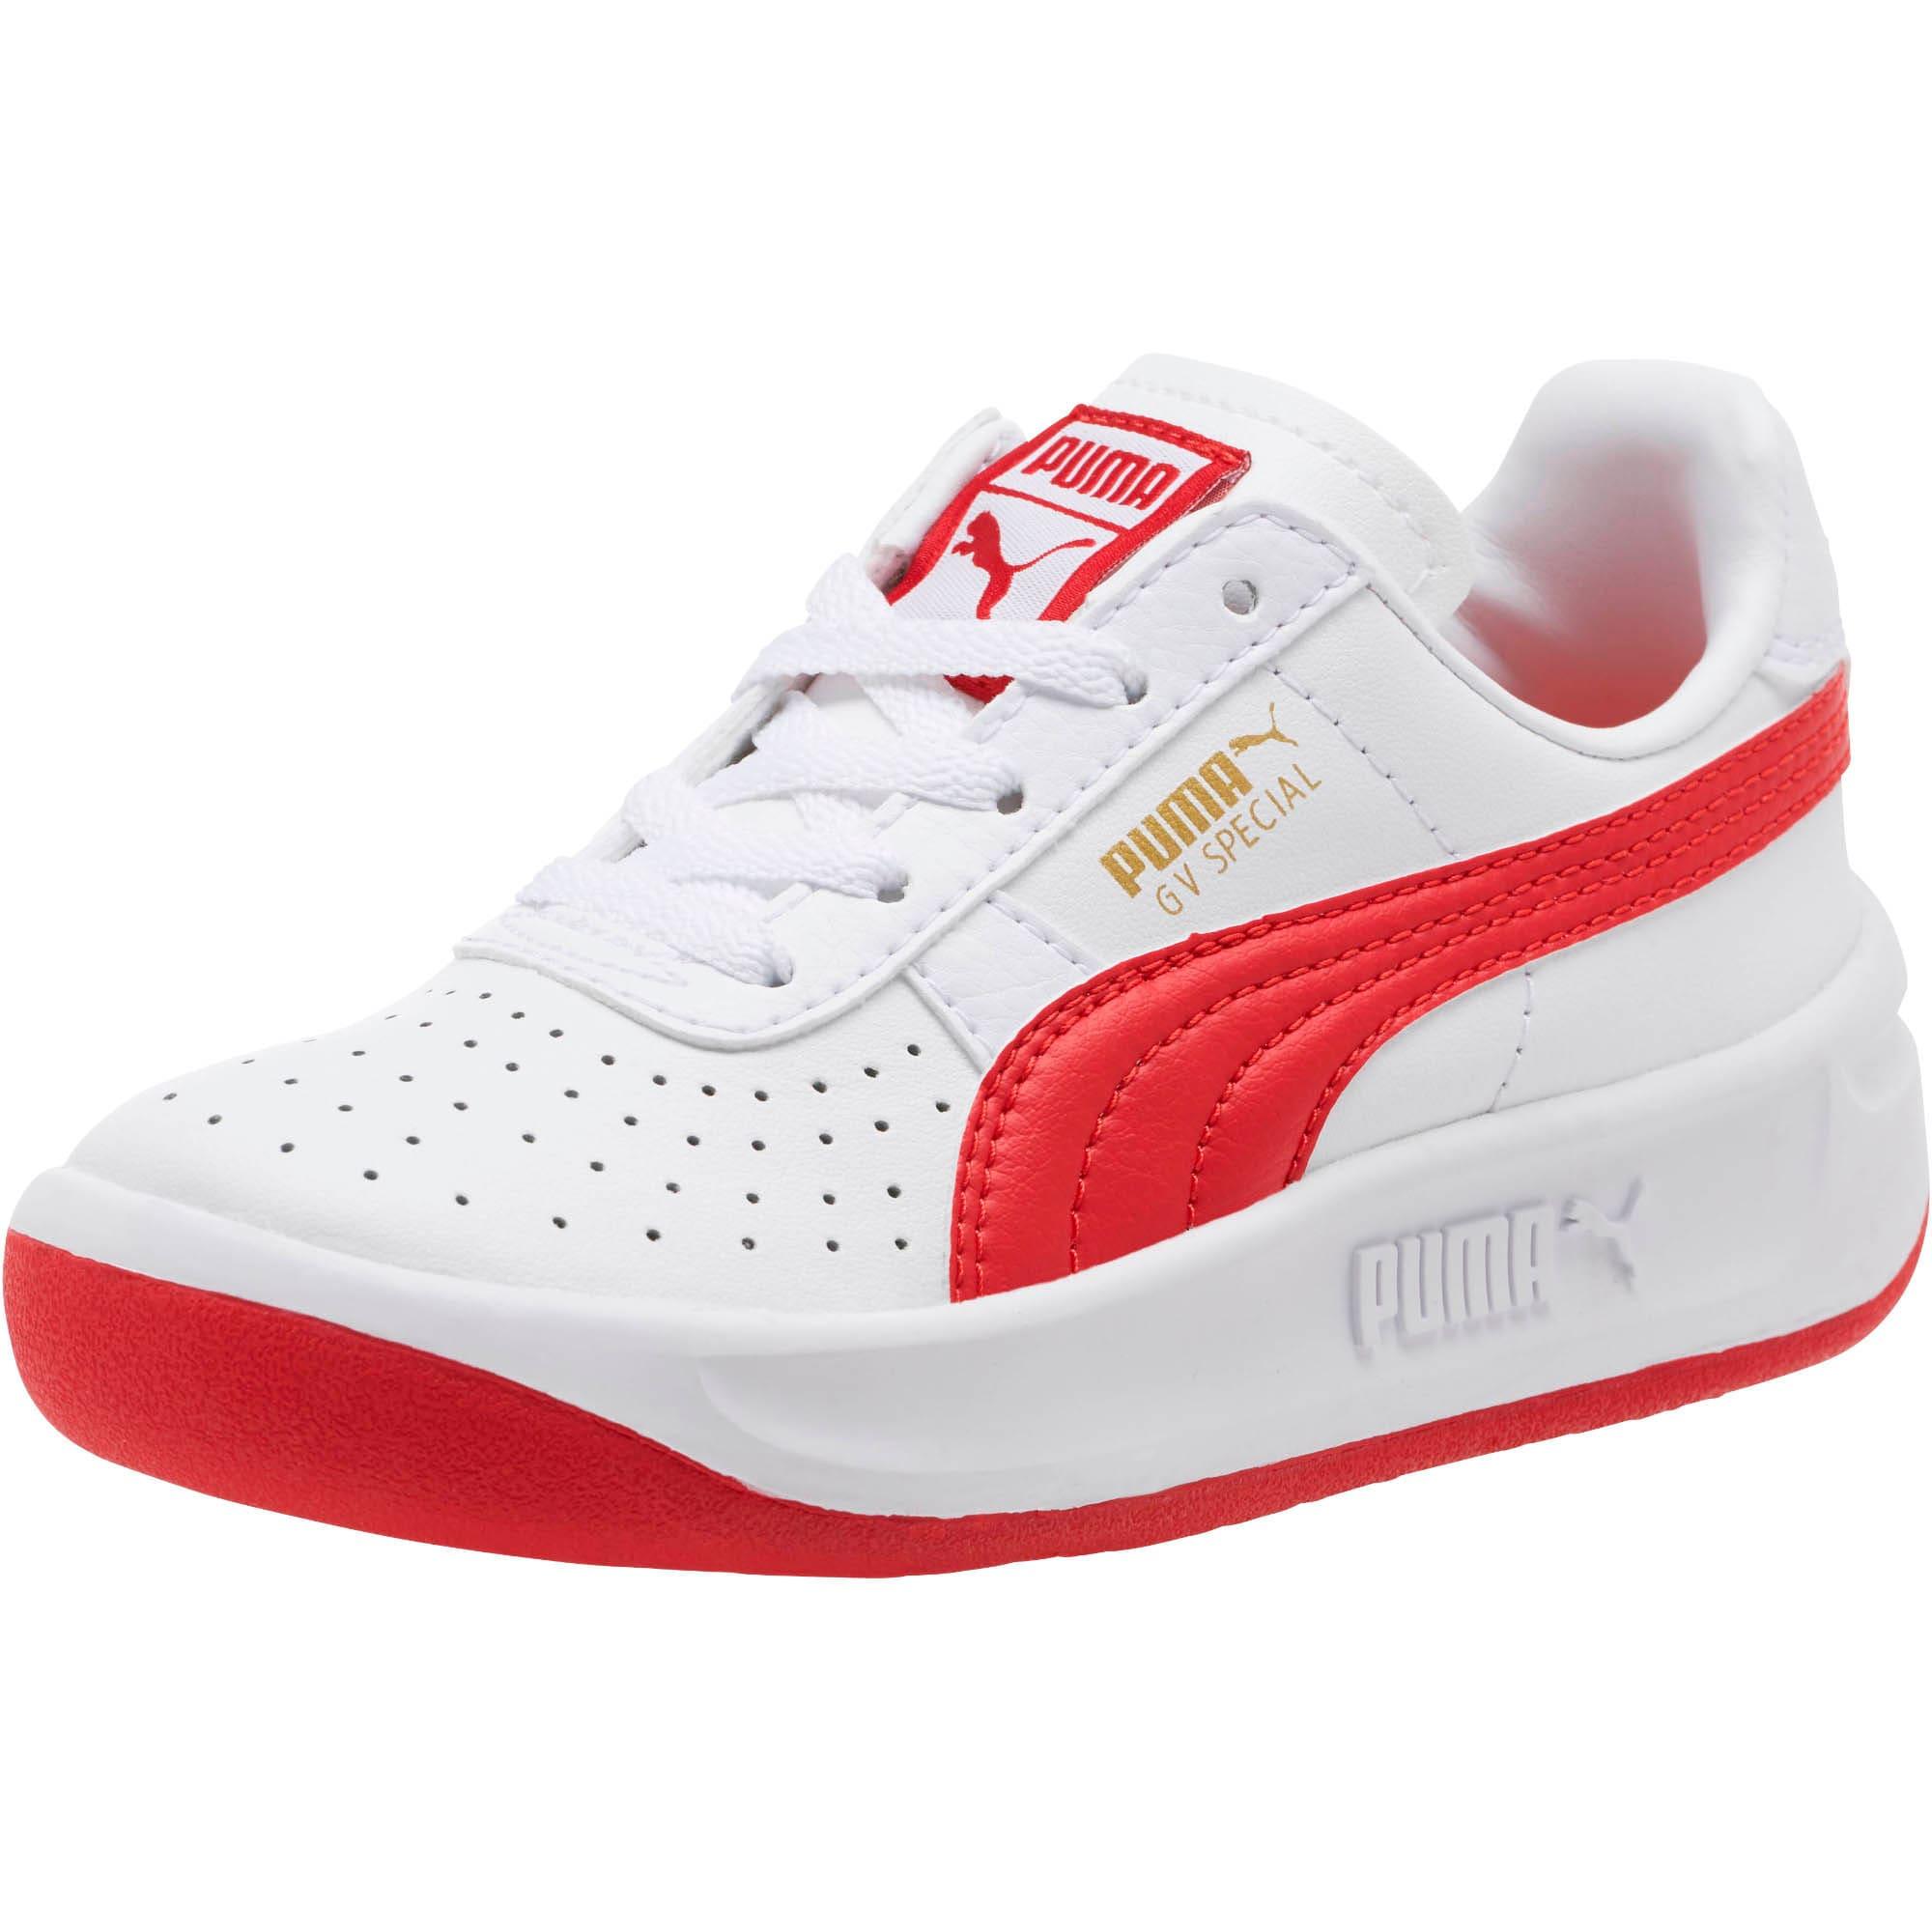 Thumbnail 1 of GV Special Little Kids' Shoes, Puma White-Ribbon Red, medium